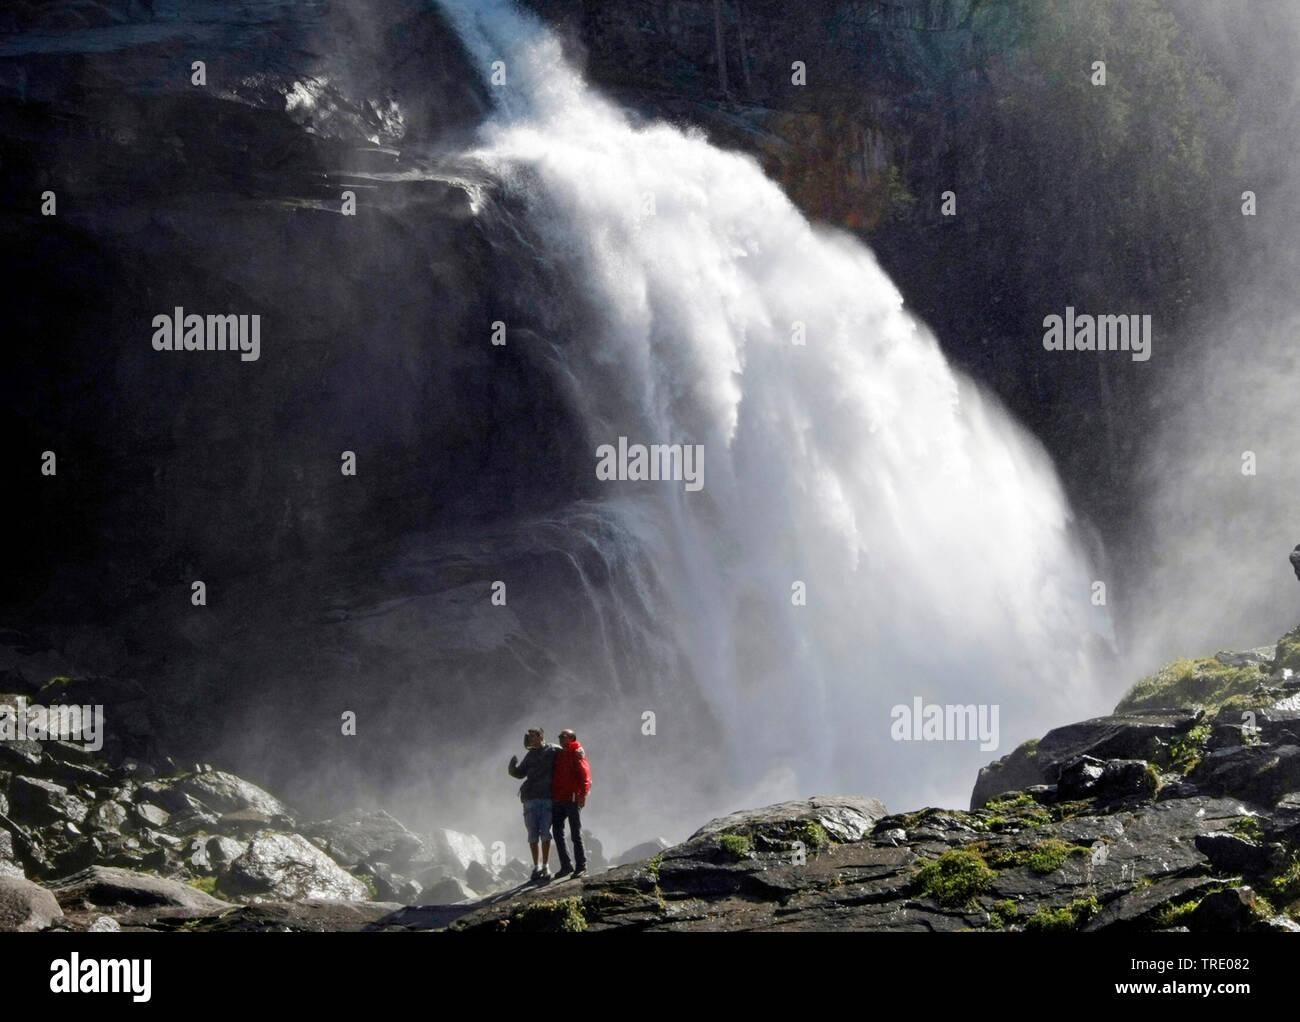 Two montain hiker in front of the Krimml Waterfalls in Salzburg state, Austria, Salzburger Land, Krimml Stock Photo